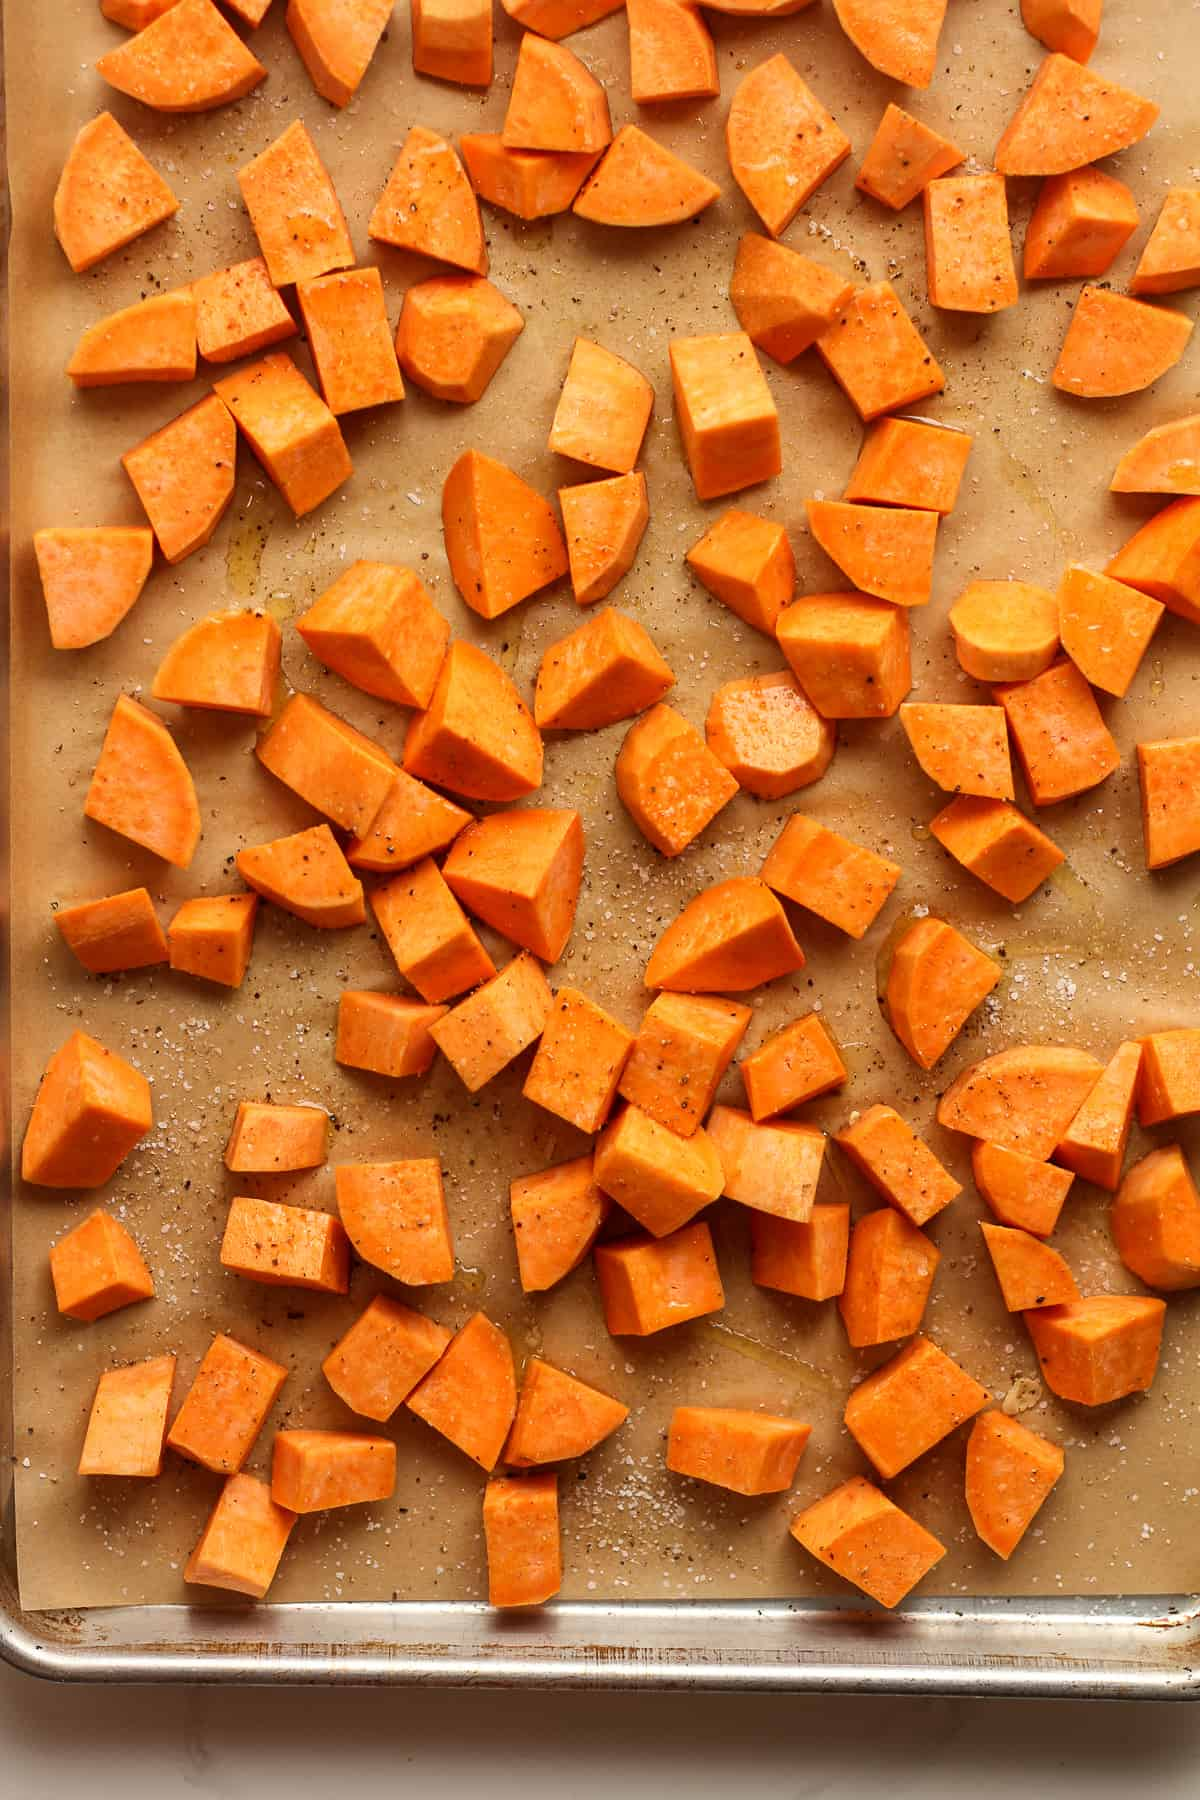 The raw chopped sweet potatoes.